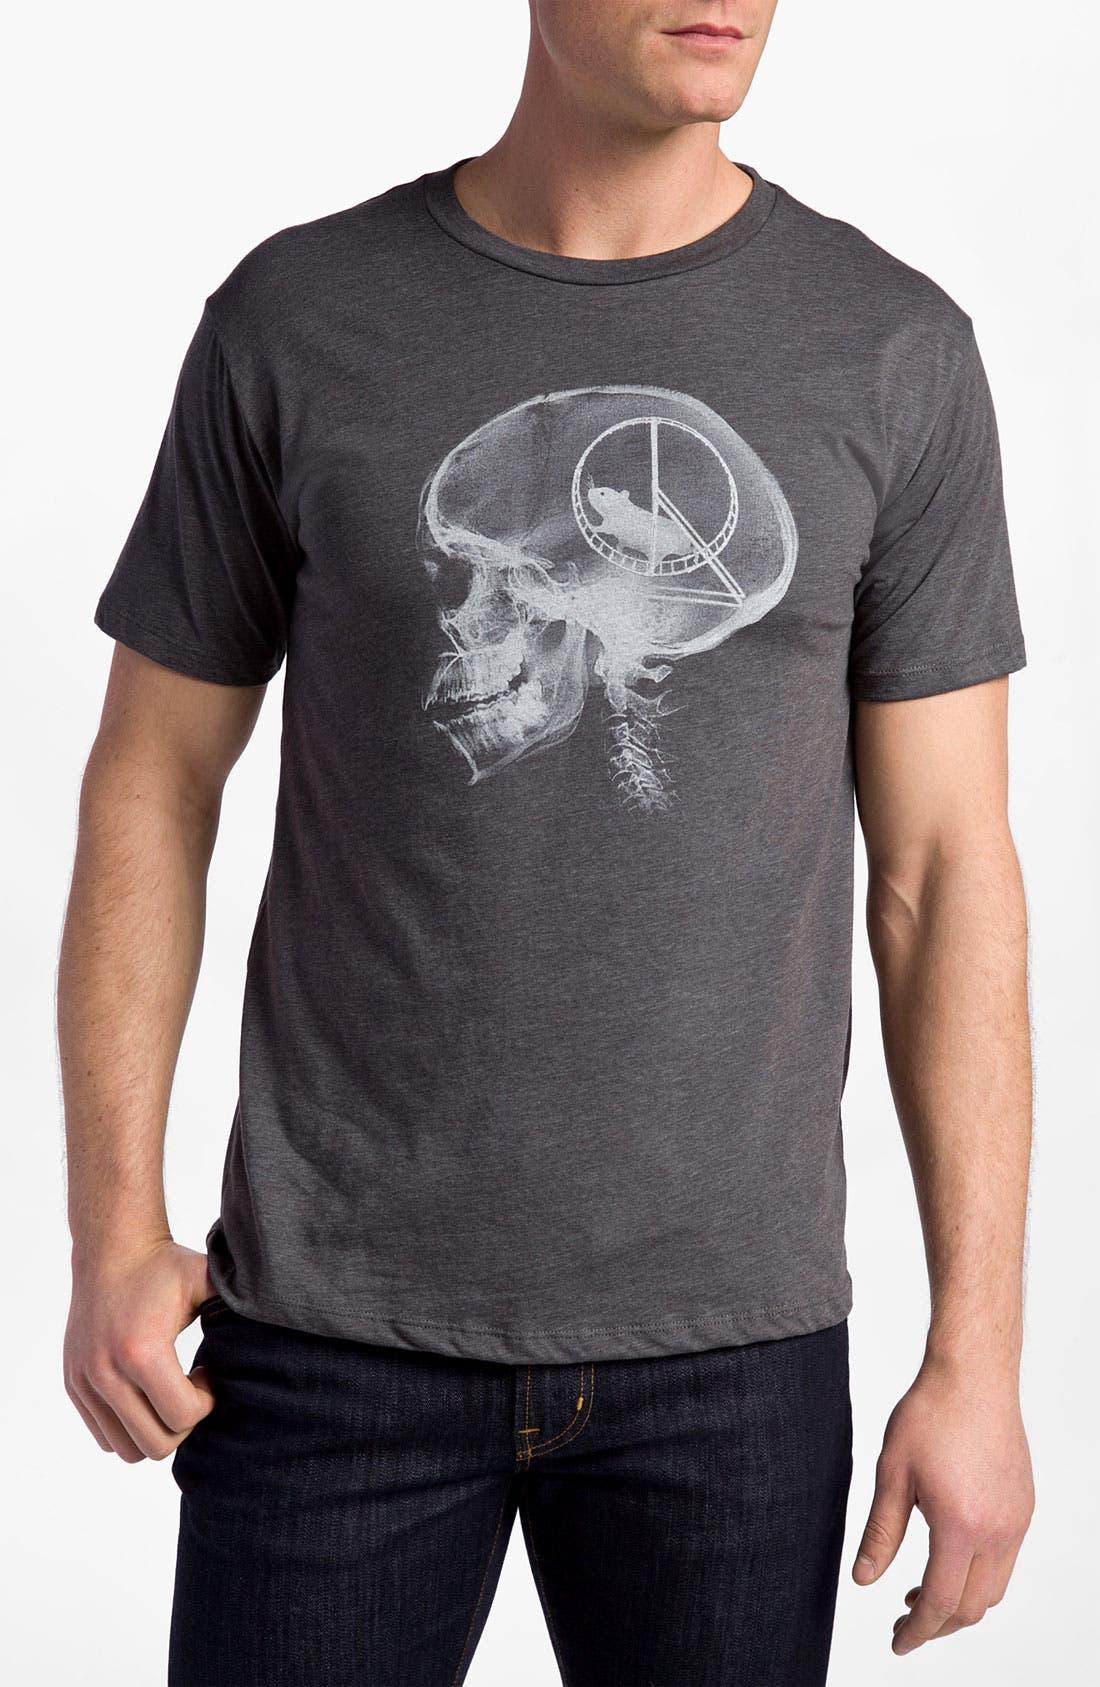 Main Image - Headline Shirts 'Hamster Head Scan' T-Shirt